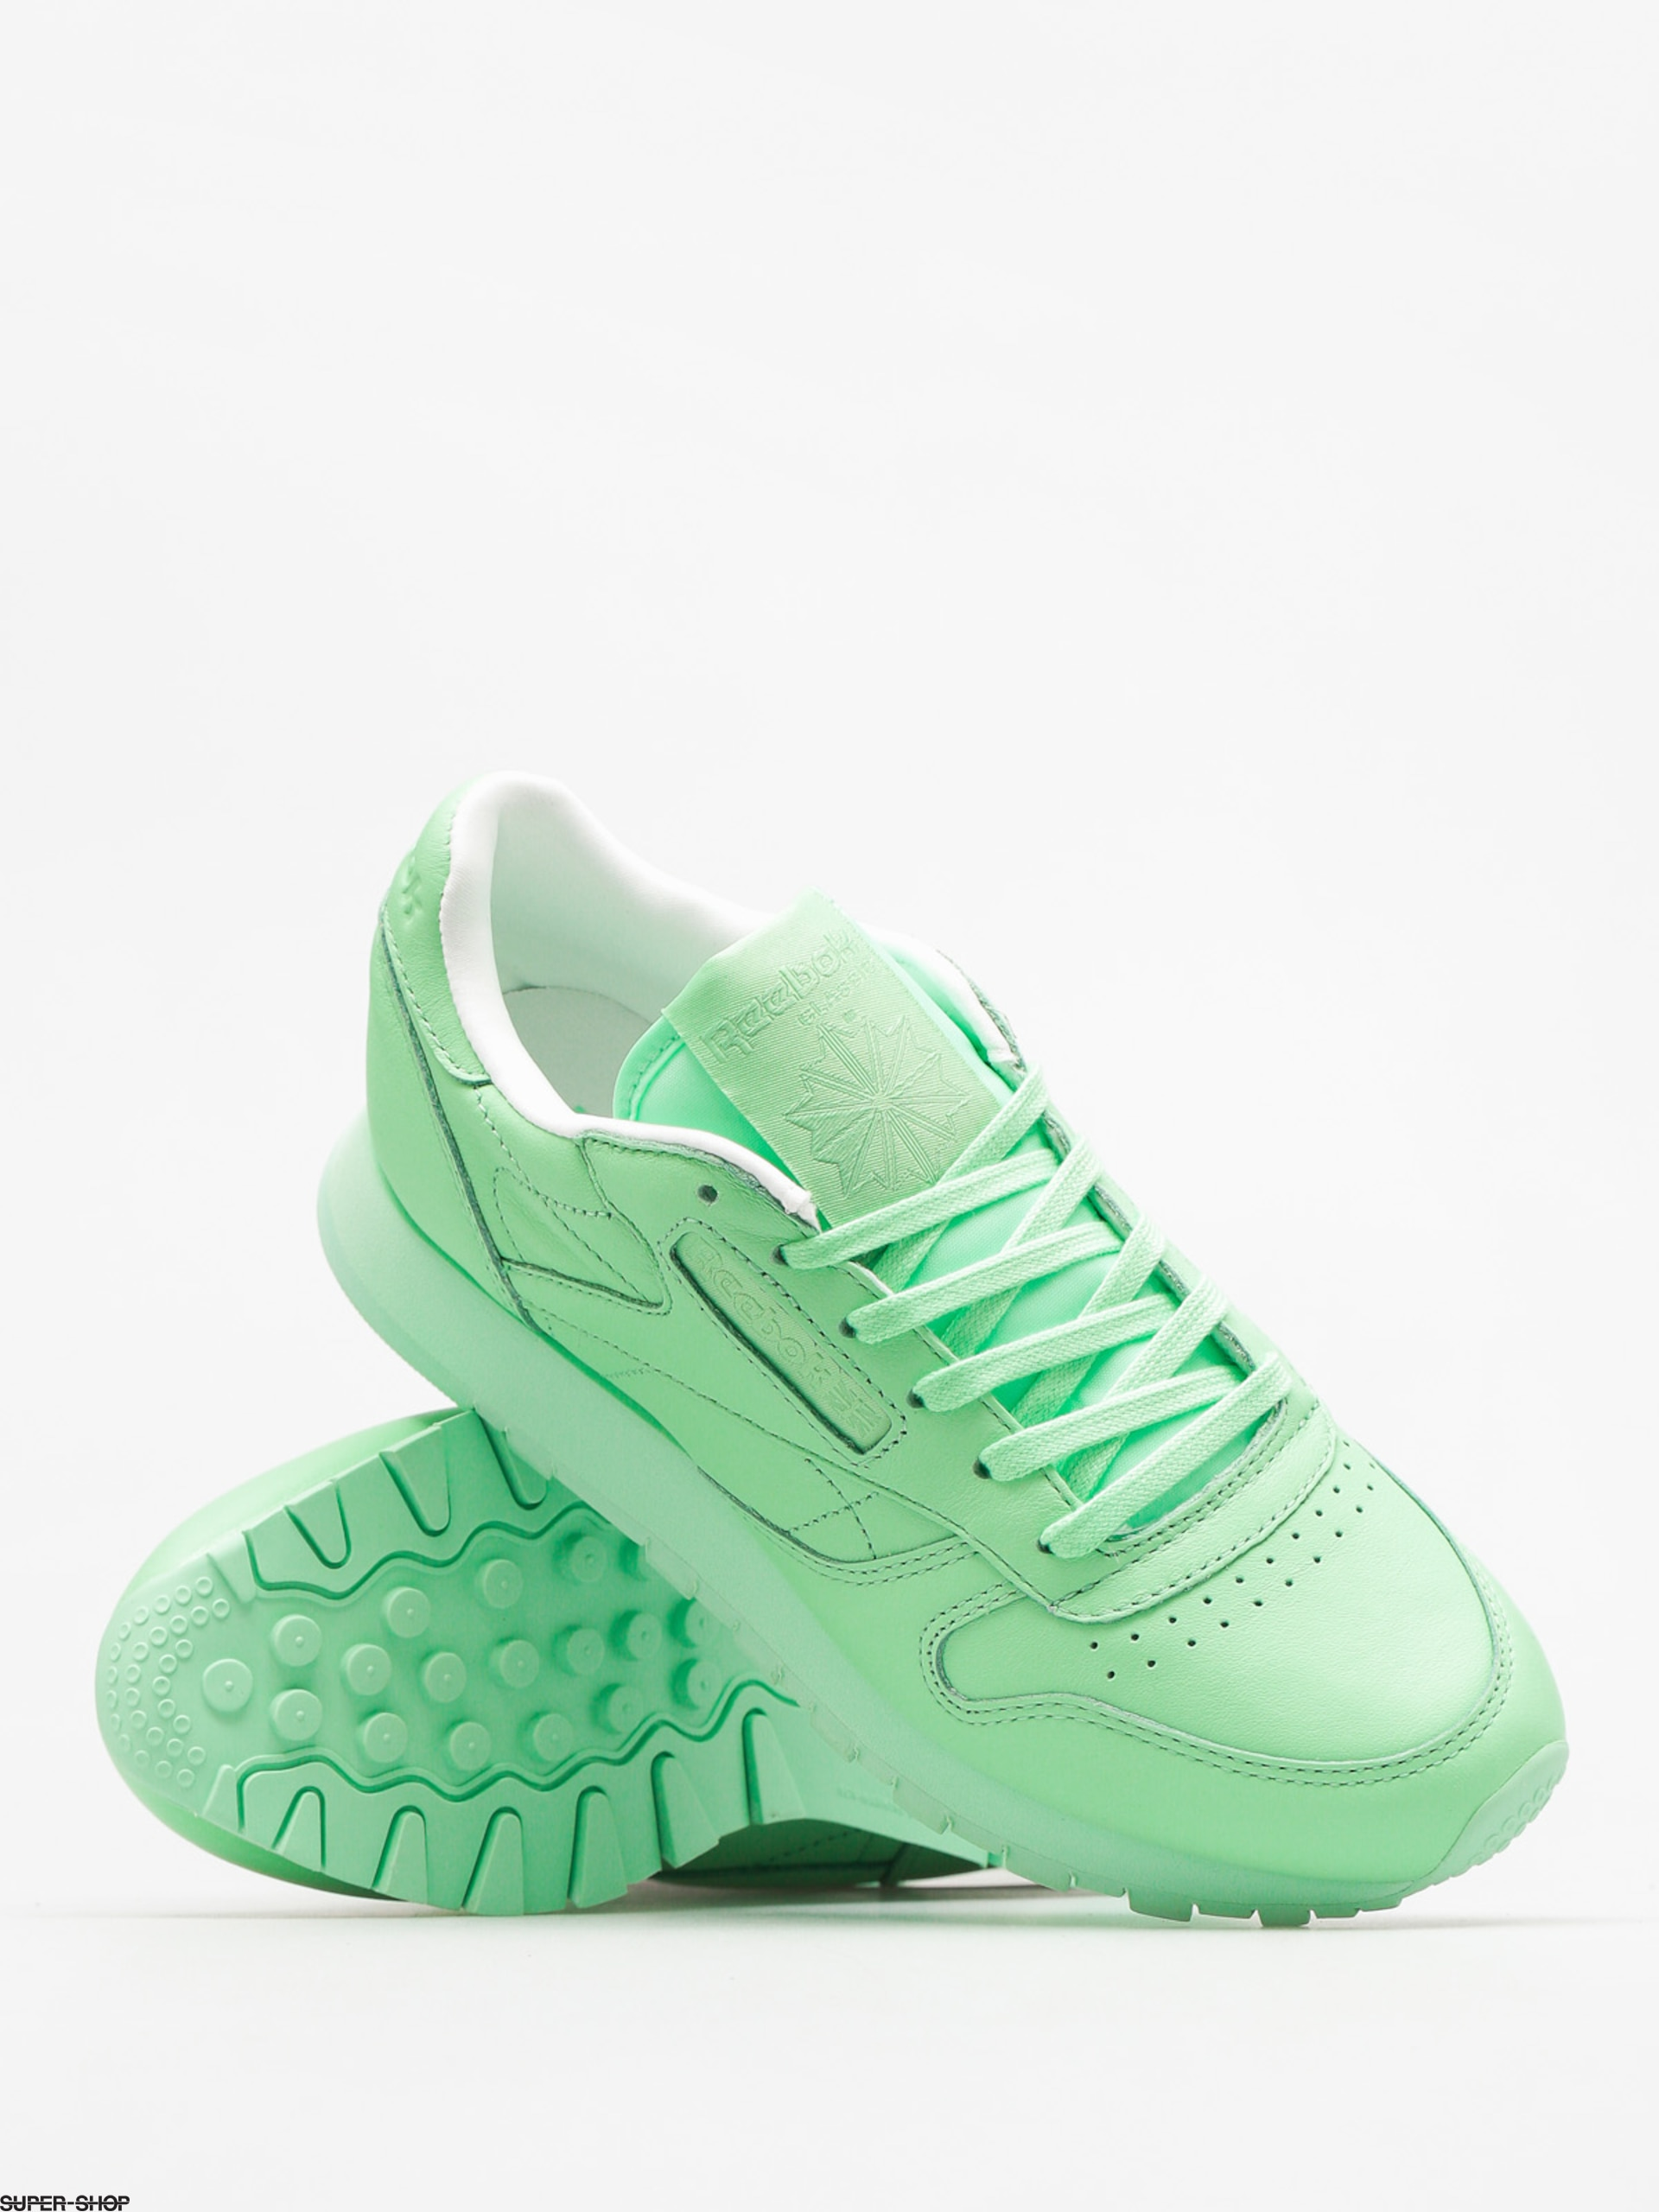 665cde3aa019 Reebok Shoes Cl Lthr Pastels Wmn (mint green white)